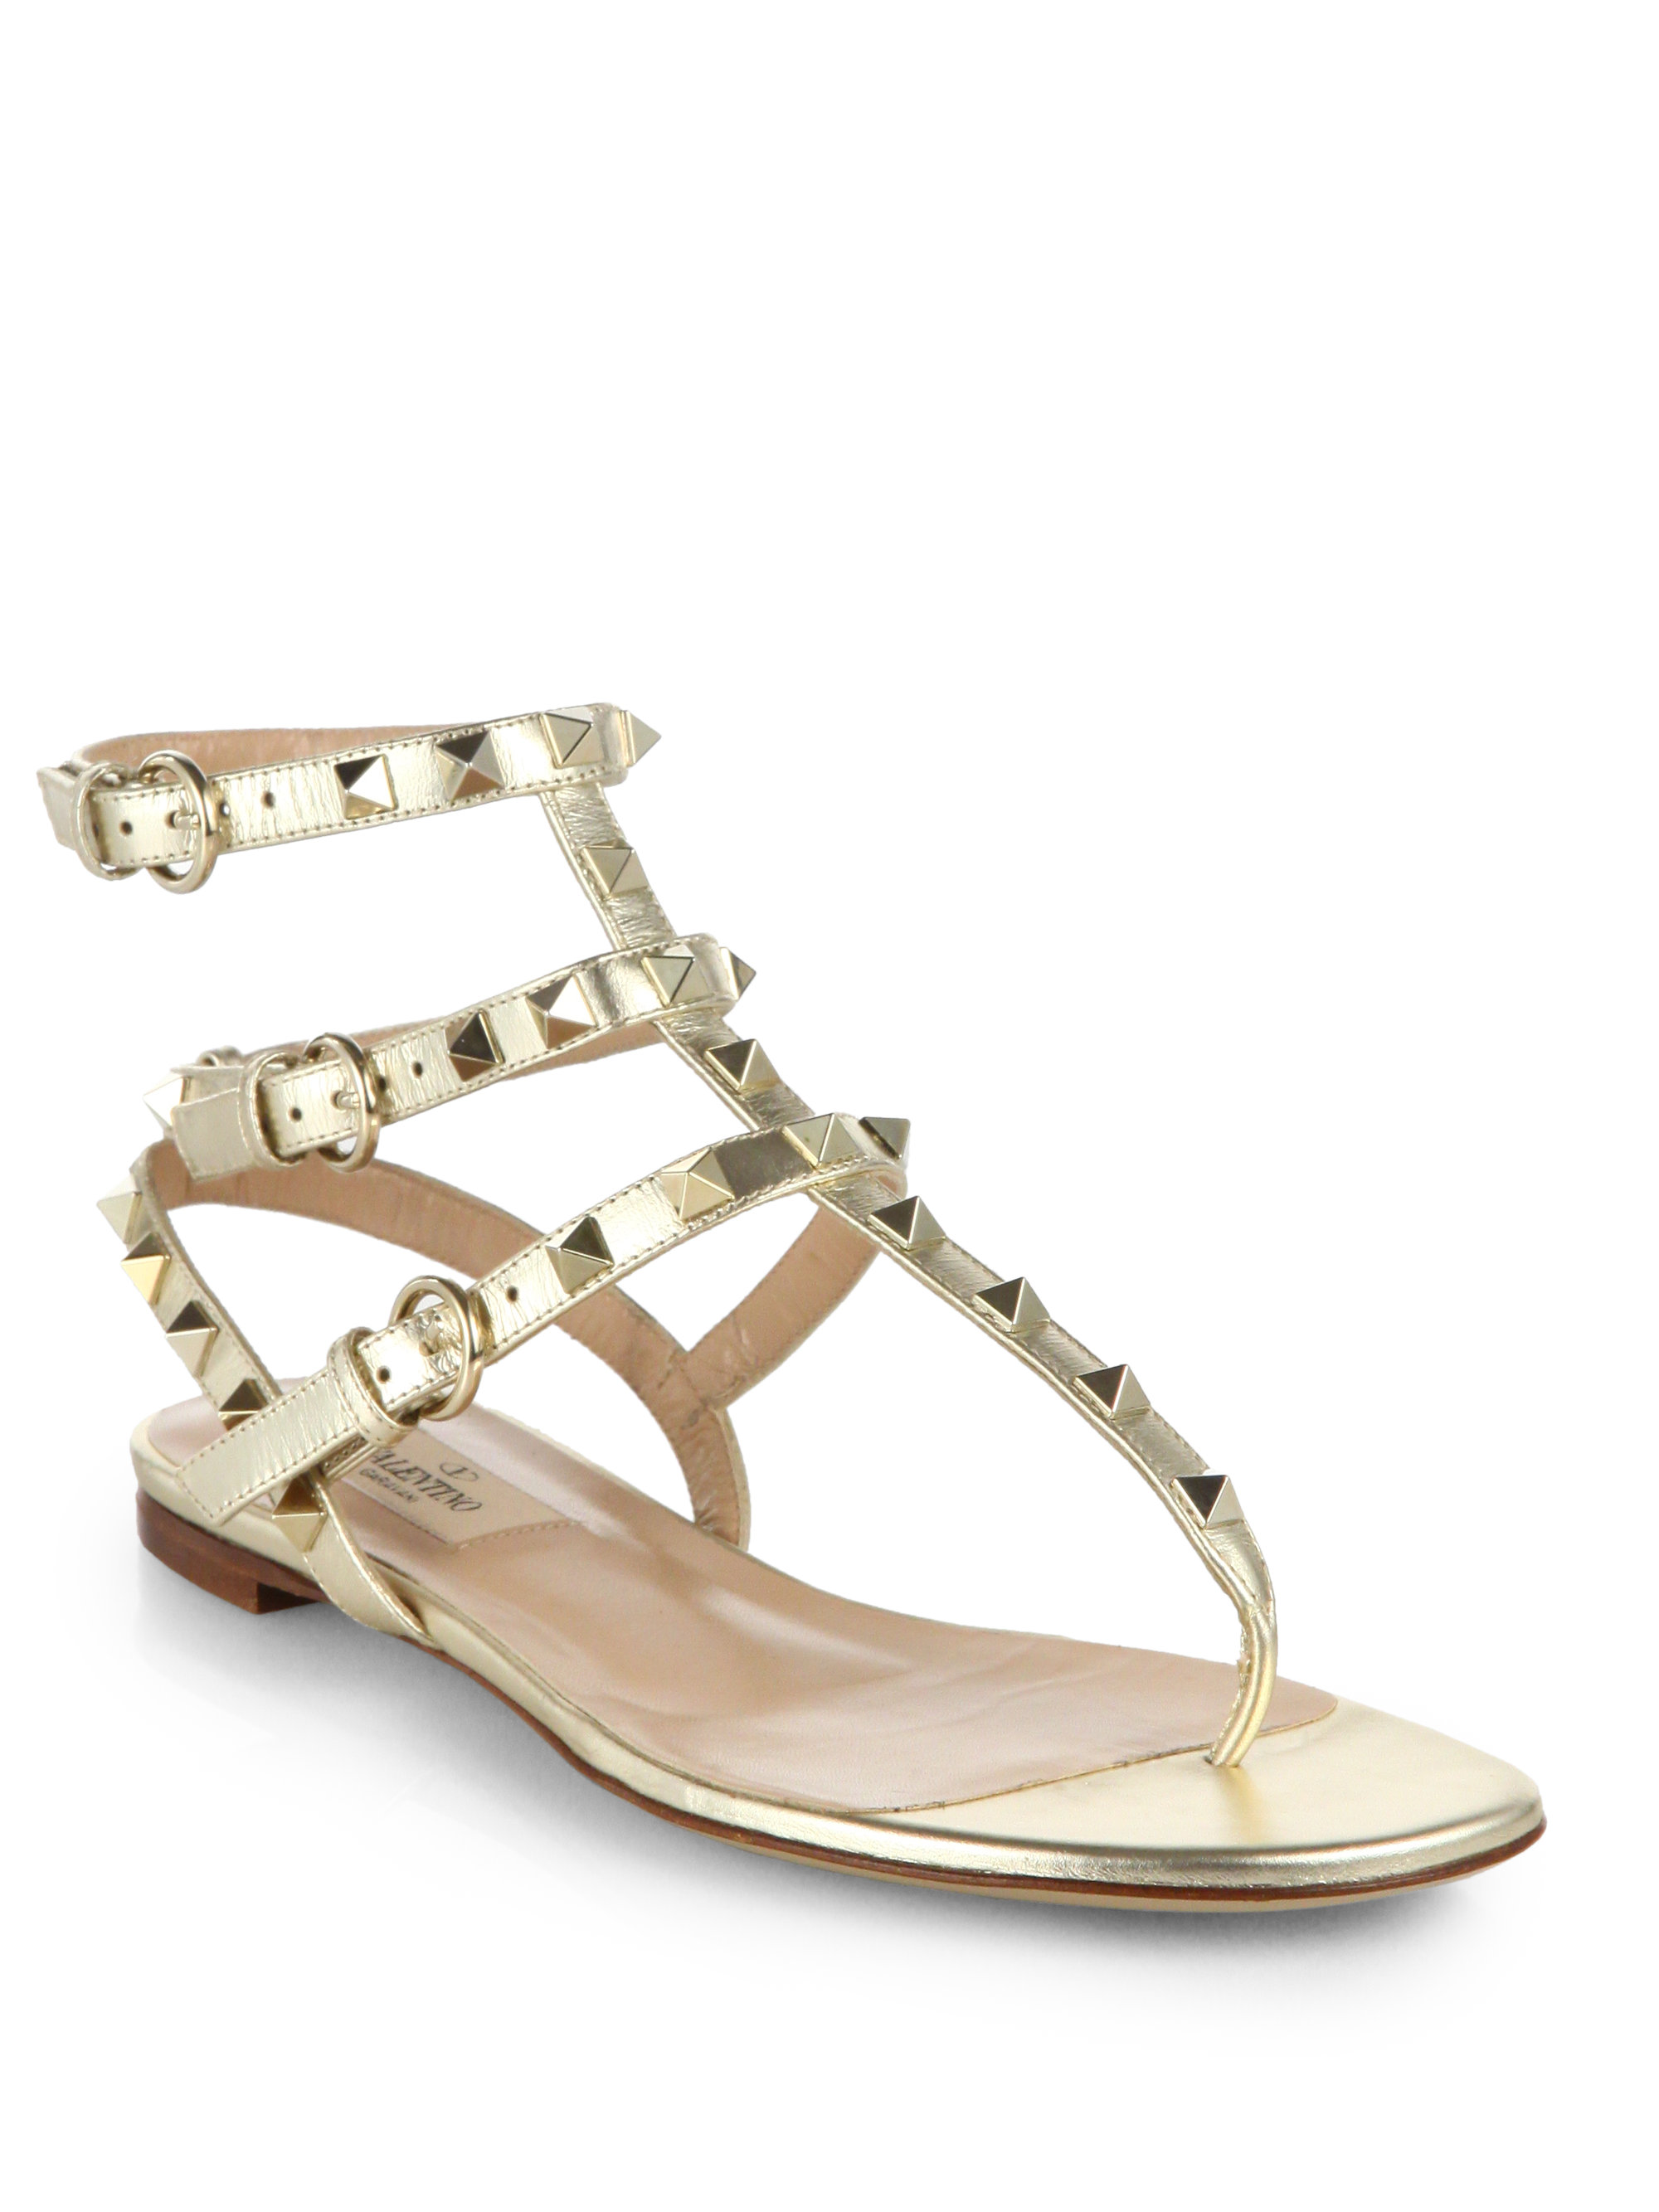 Lyst - Valentino Rockstud Metallic Leather Thong Sandals in Metallic